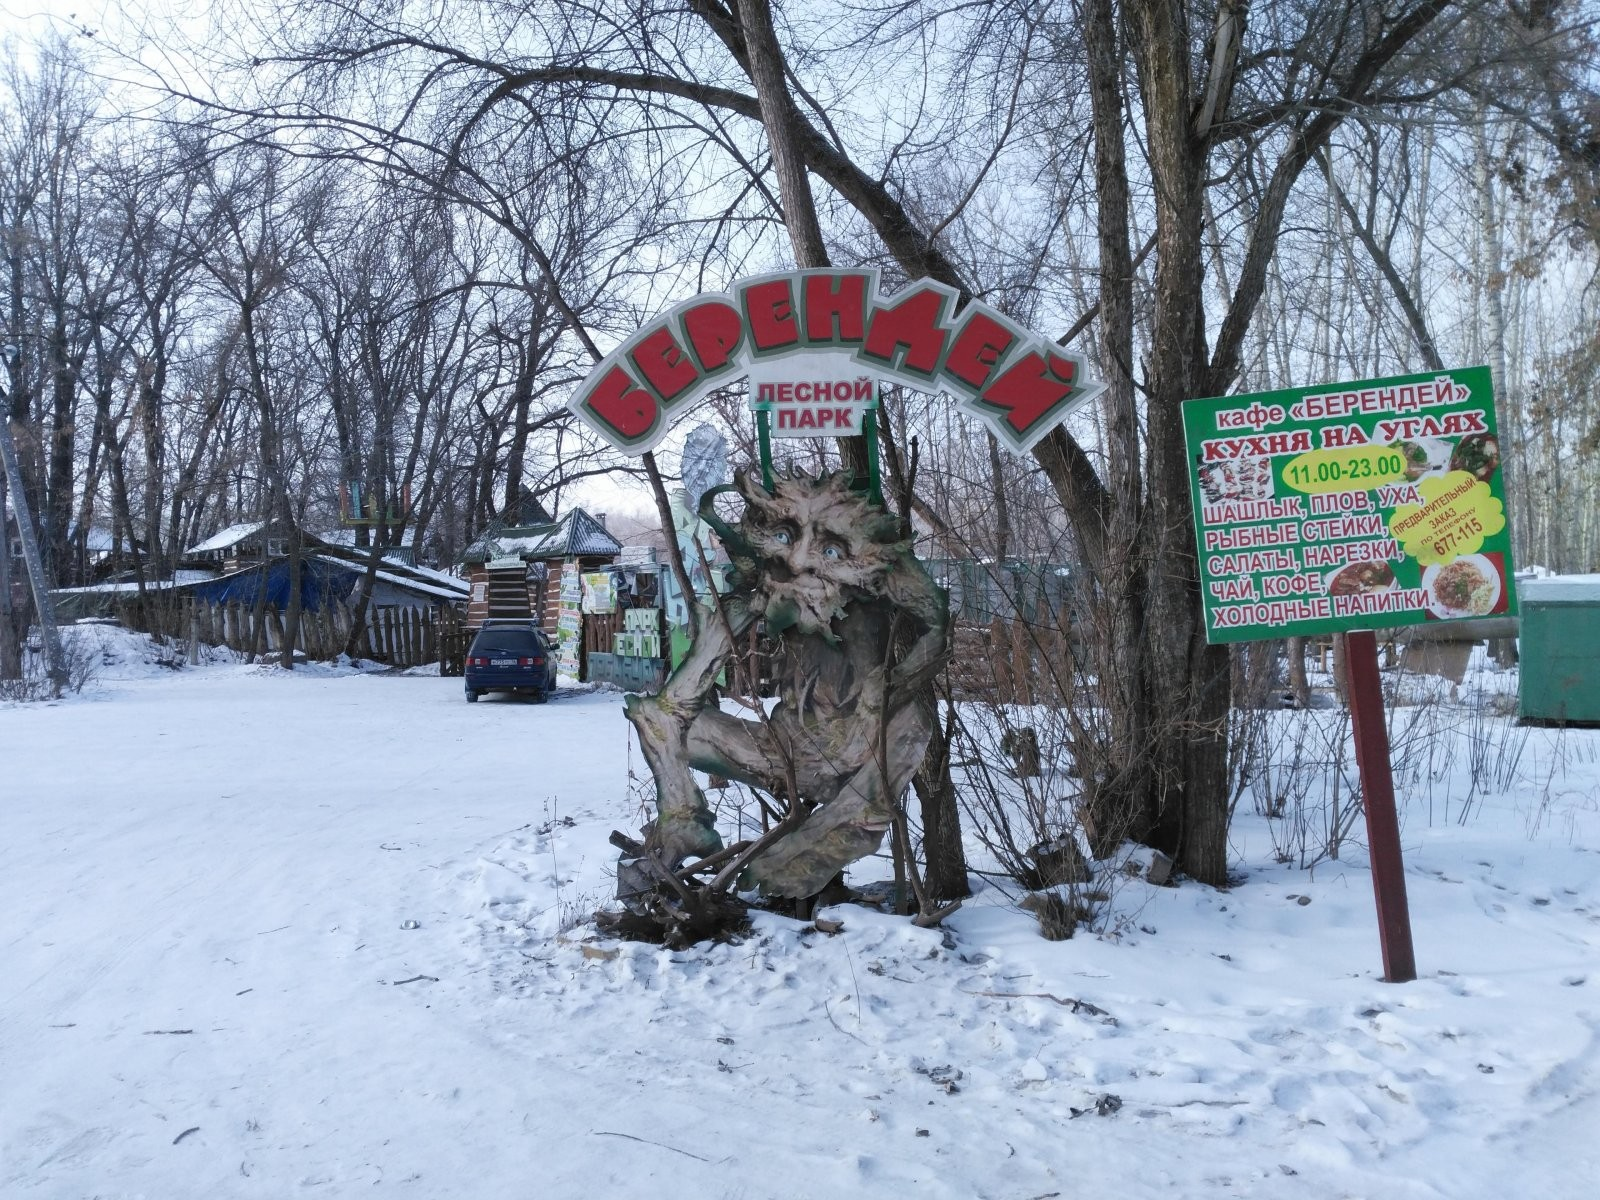 Берендей, ландшафтный парк - №1